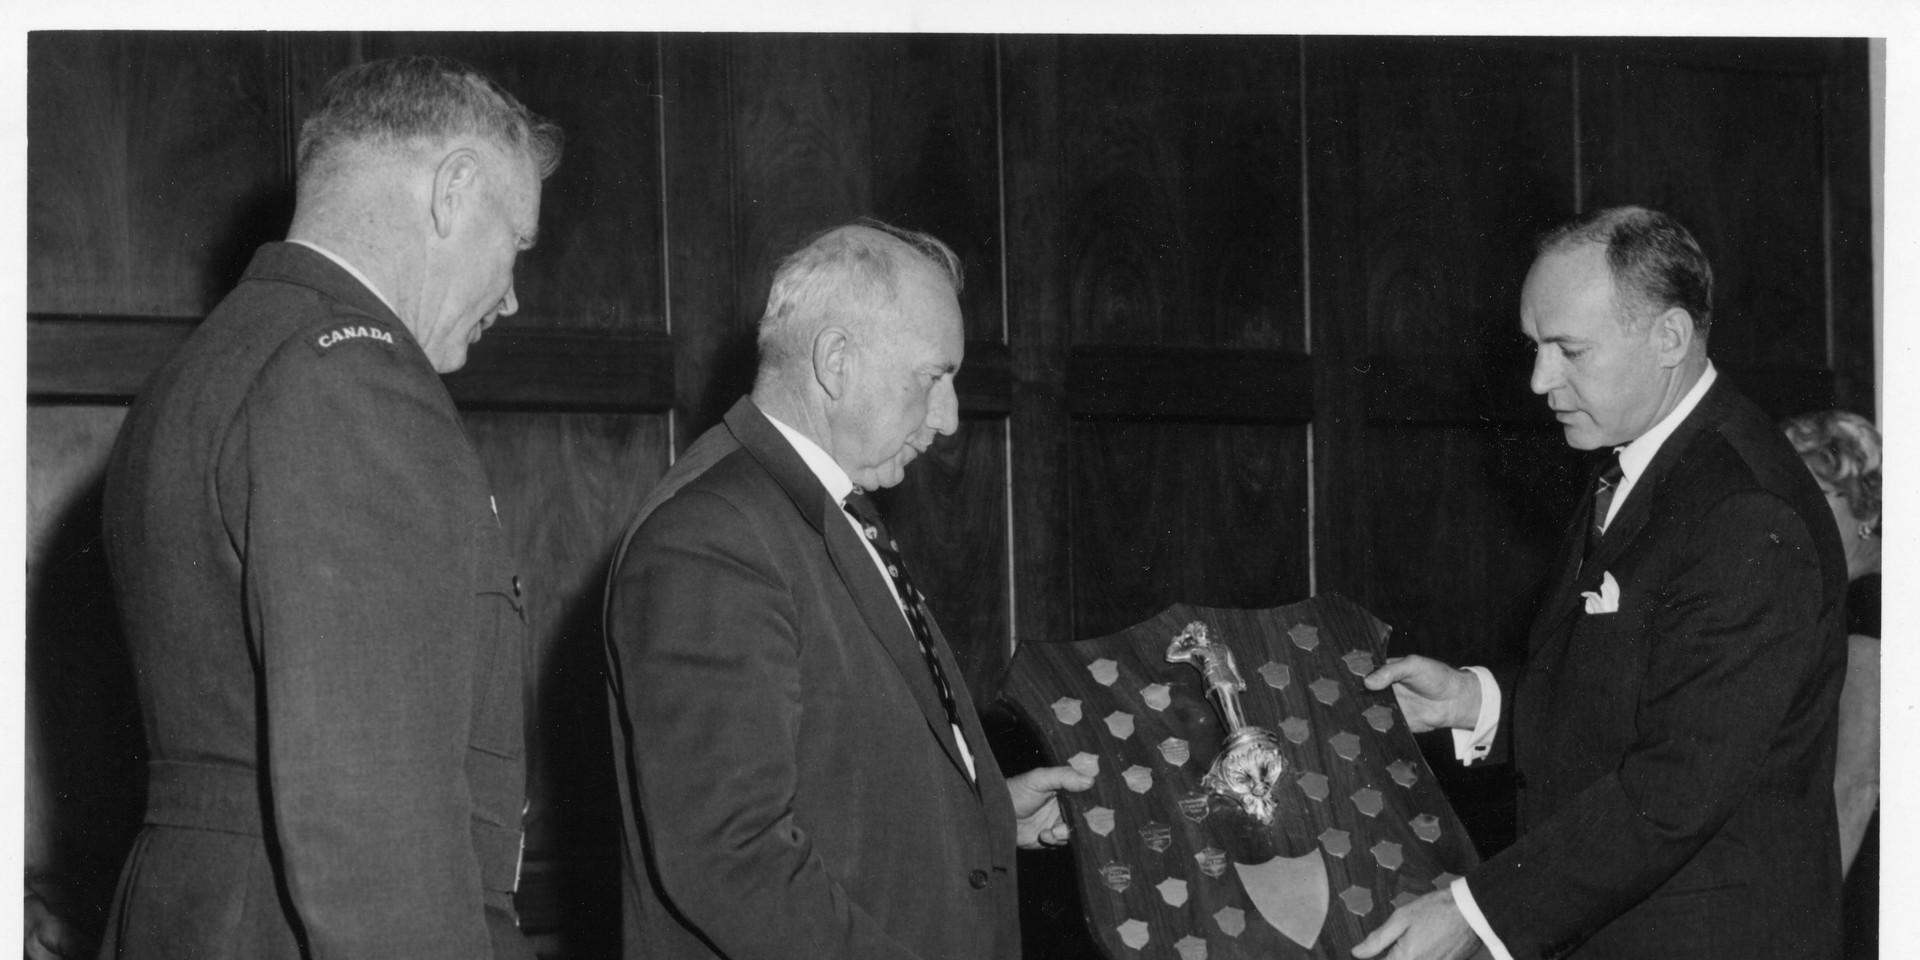 21. Fall 1967 - Joseph Beauregard, fathe